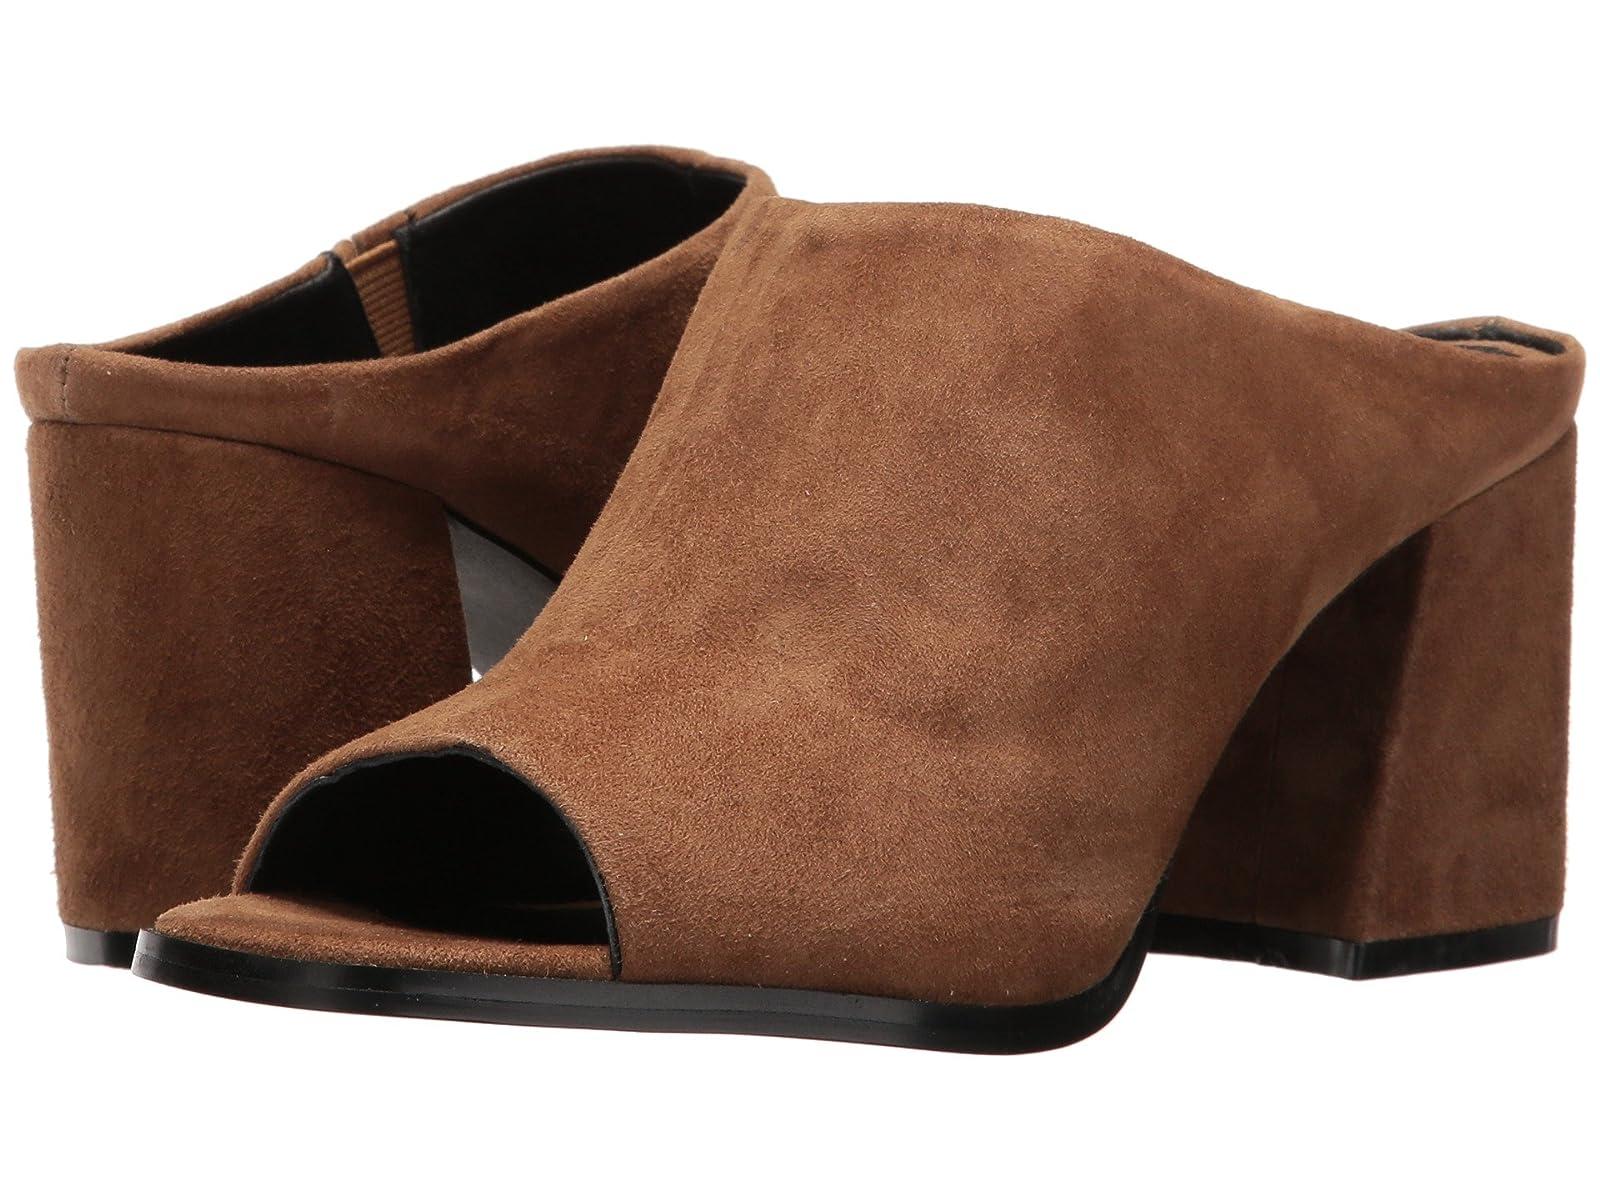 Sol Sana Marc MuleCheap and distinctive eye-catching shoes